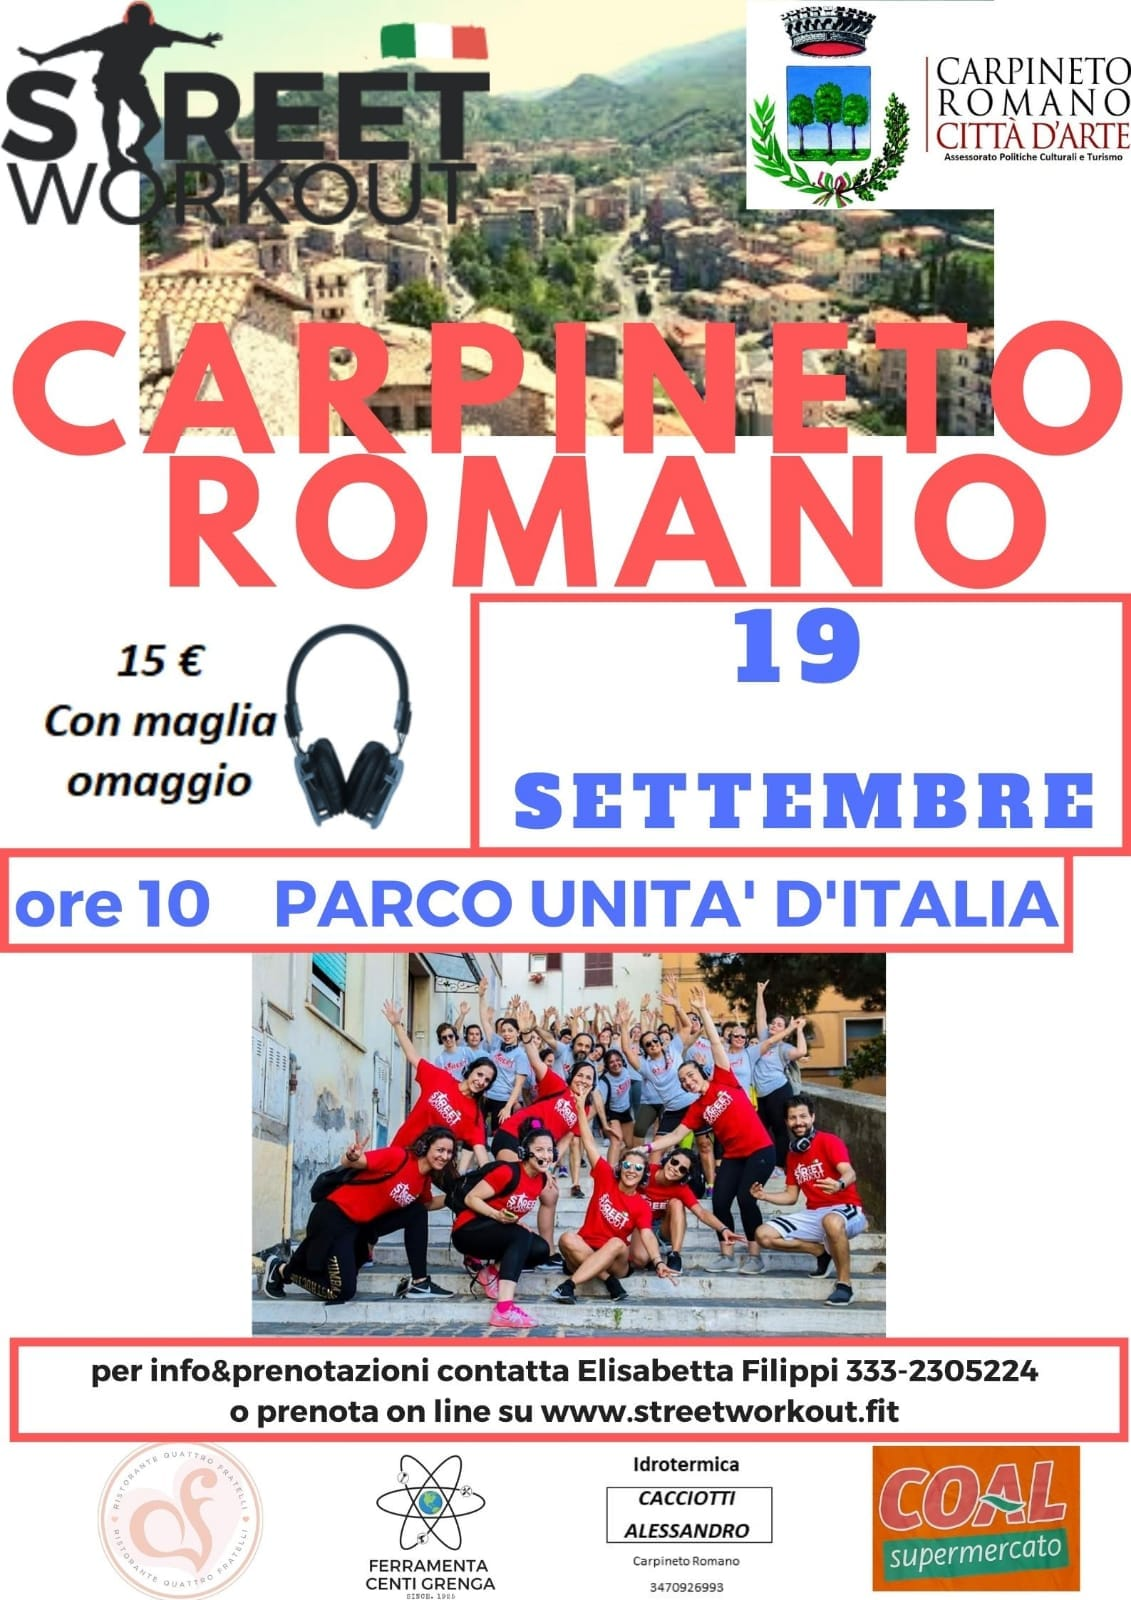 Carpineto Romano: Street Workout @ Carpineto Romano